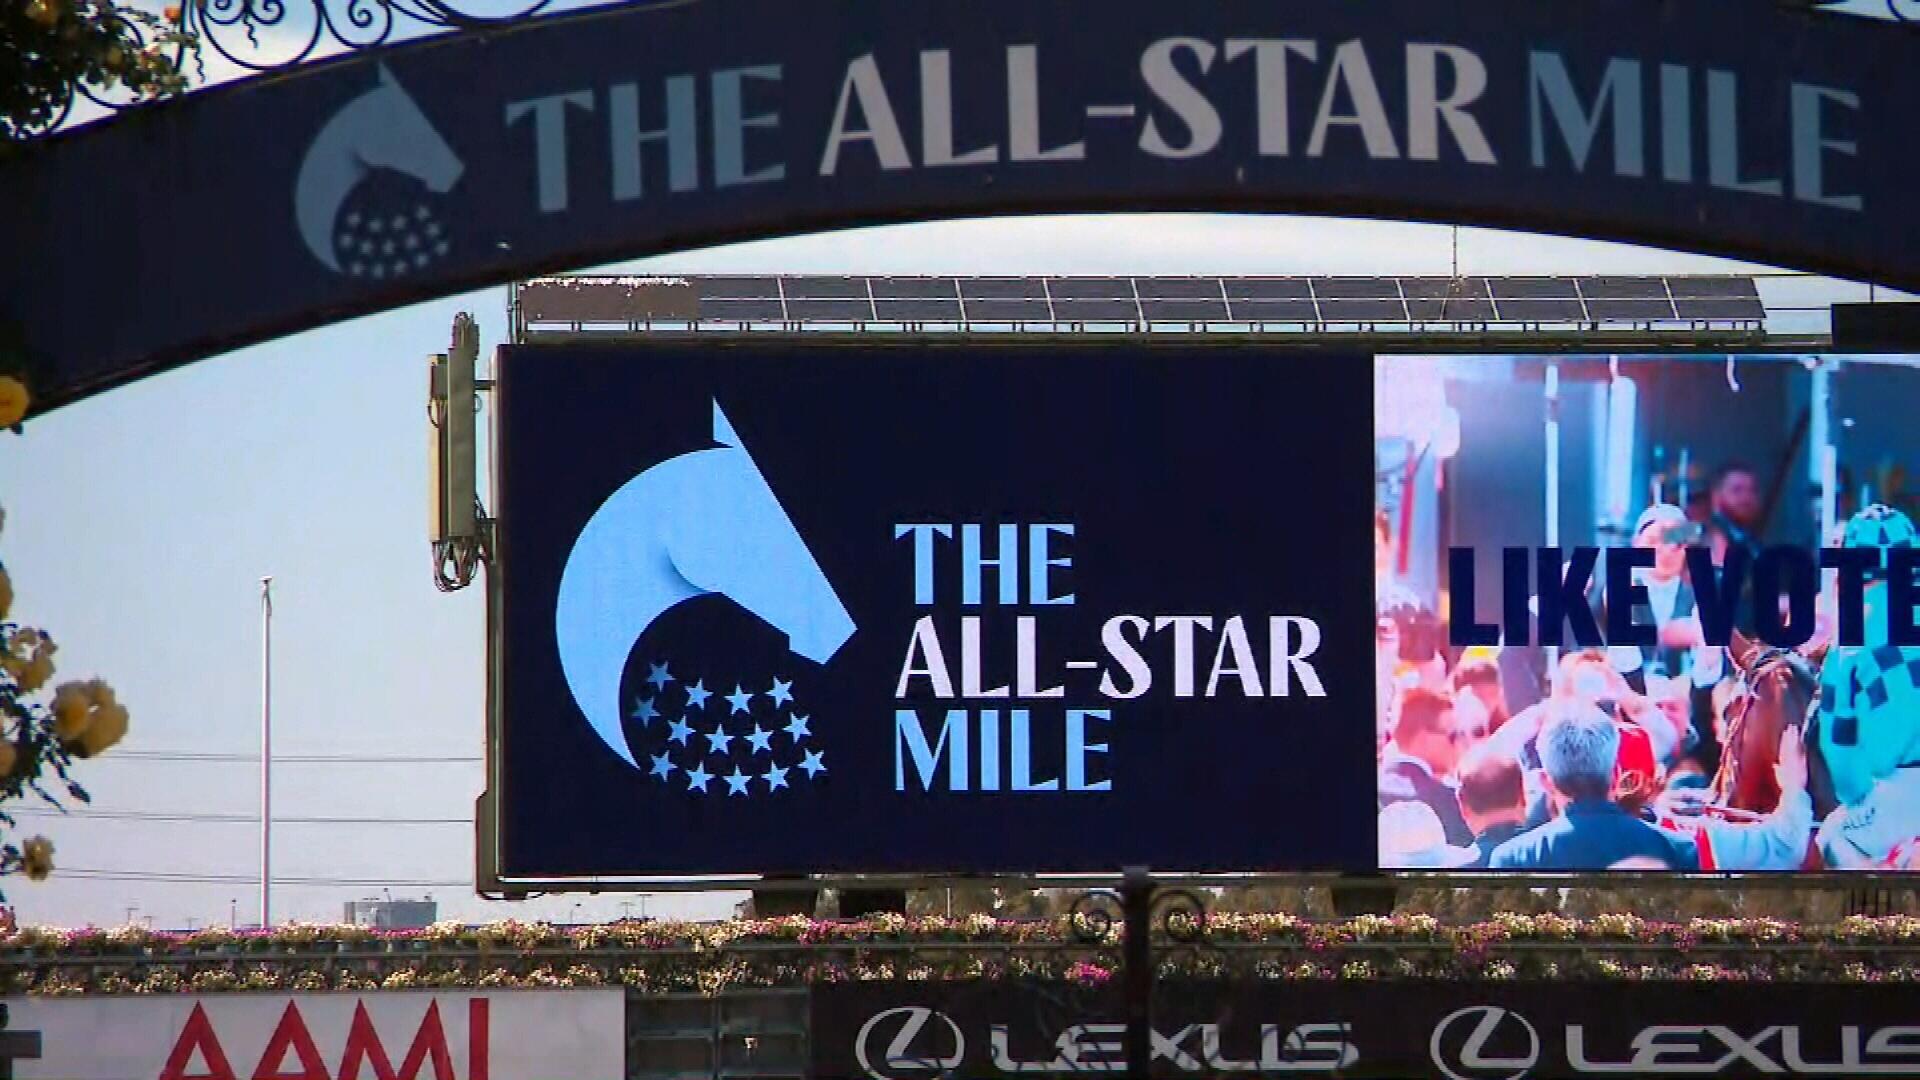 New $5 million race for Melbourne